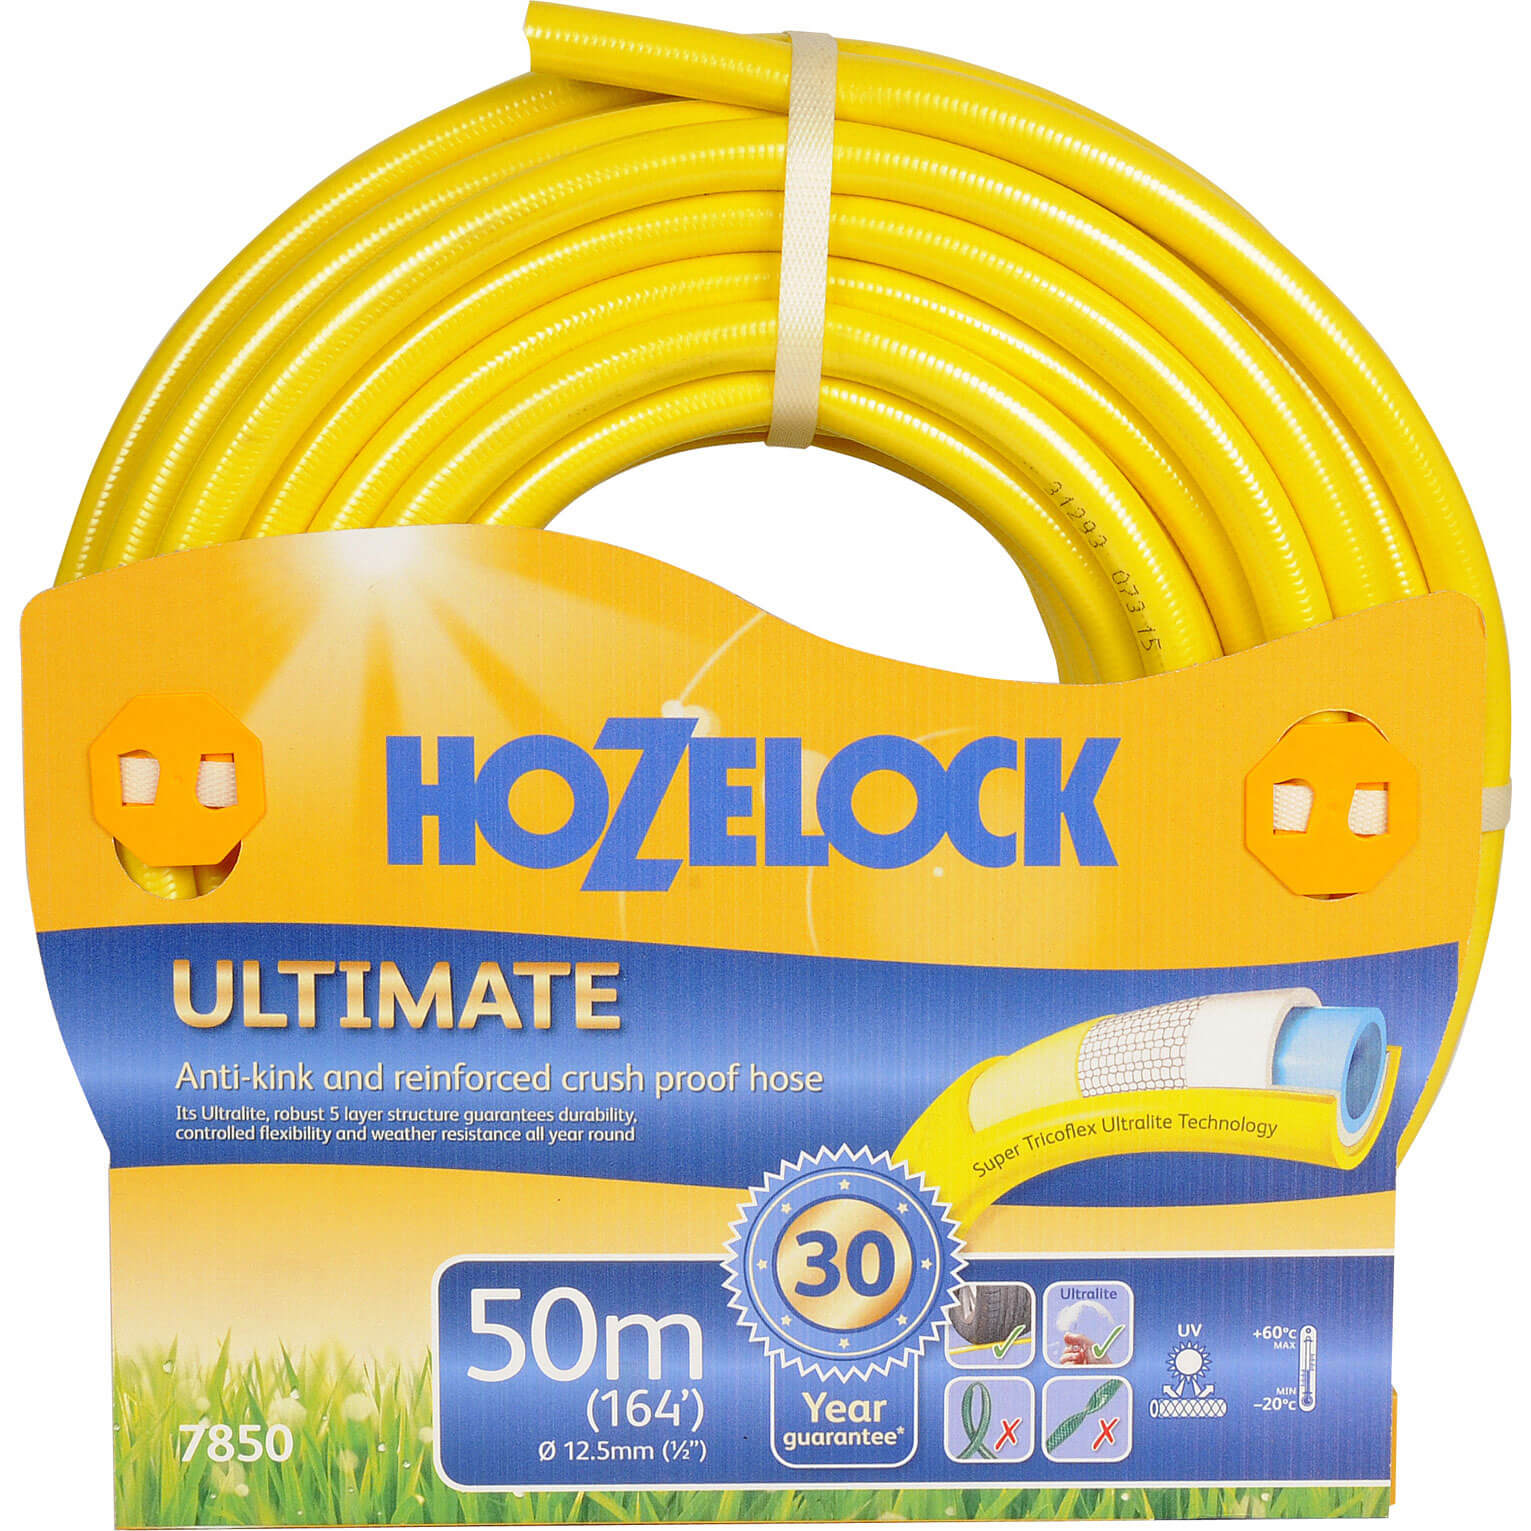 Hozelock 50 Metre Ultimate Anti-Kink & Anti-Twist Hose Pipe 12.5mm (1/2&quot)